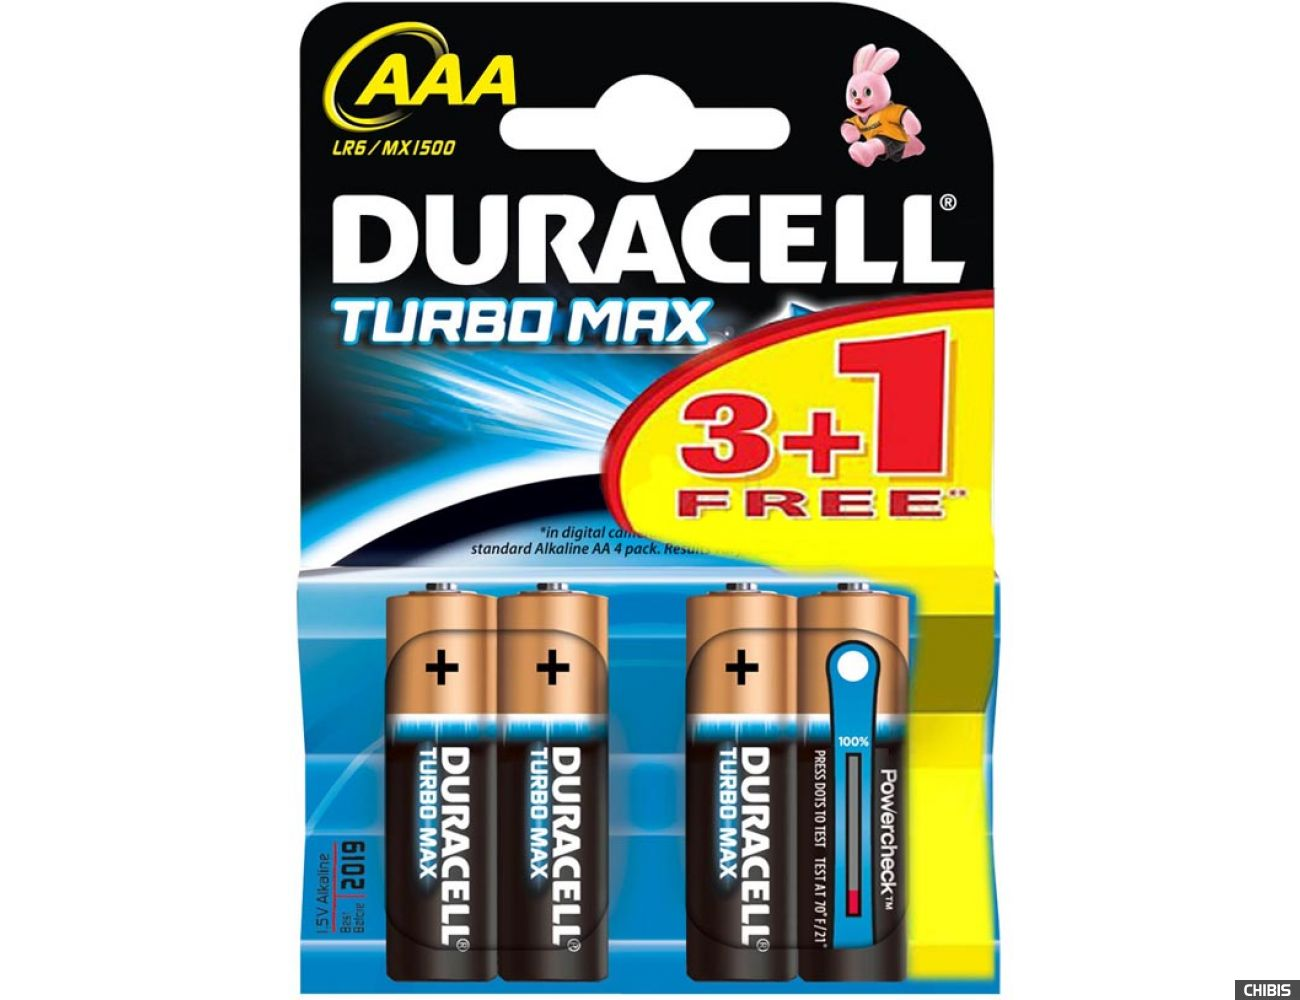 Батарейка ААА Duracell Turbo Max LR03 1.5V Alkaline 3 шт+1 бесплатно блистер 4/4шт.